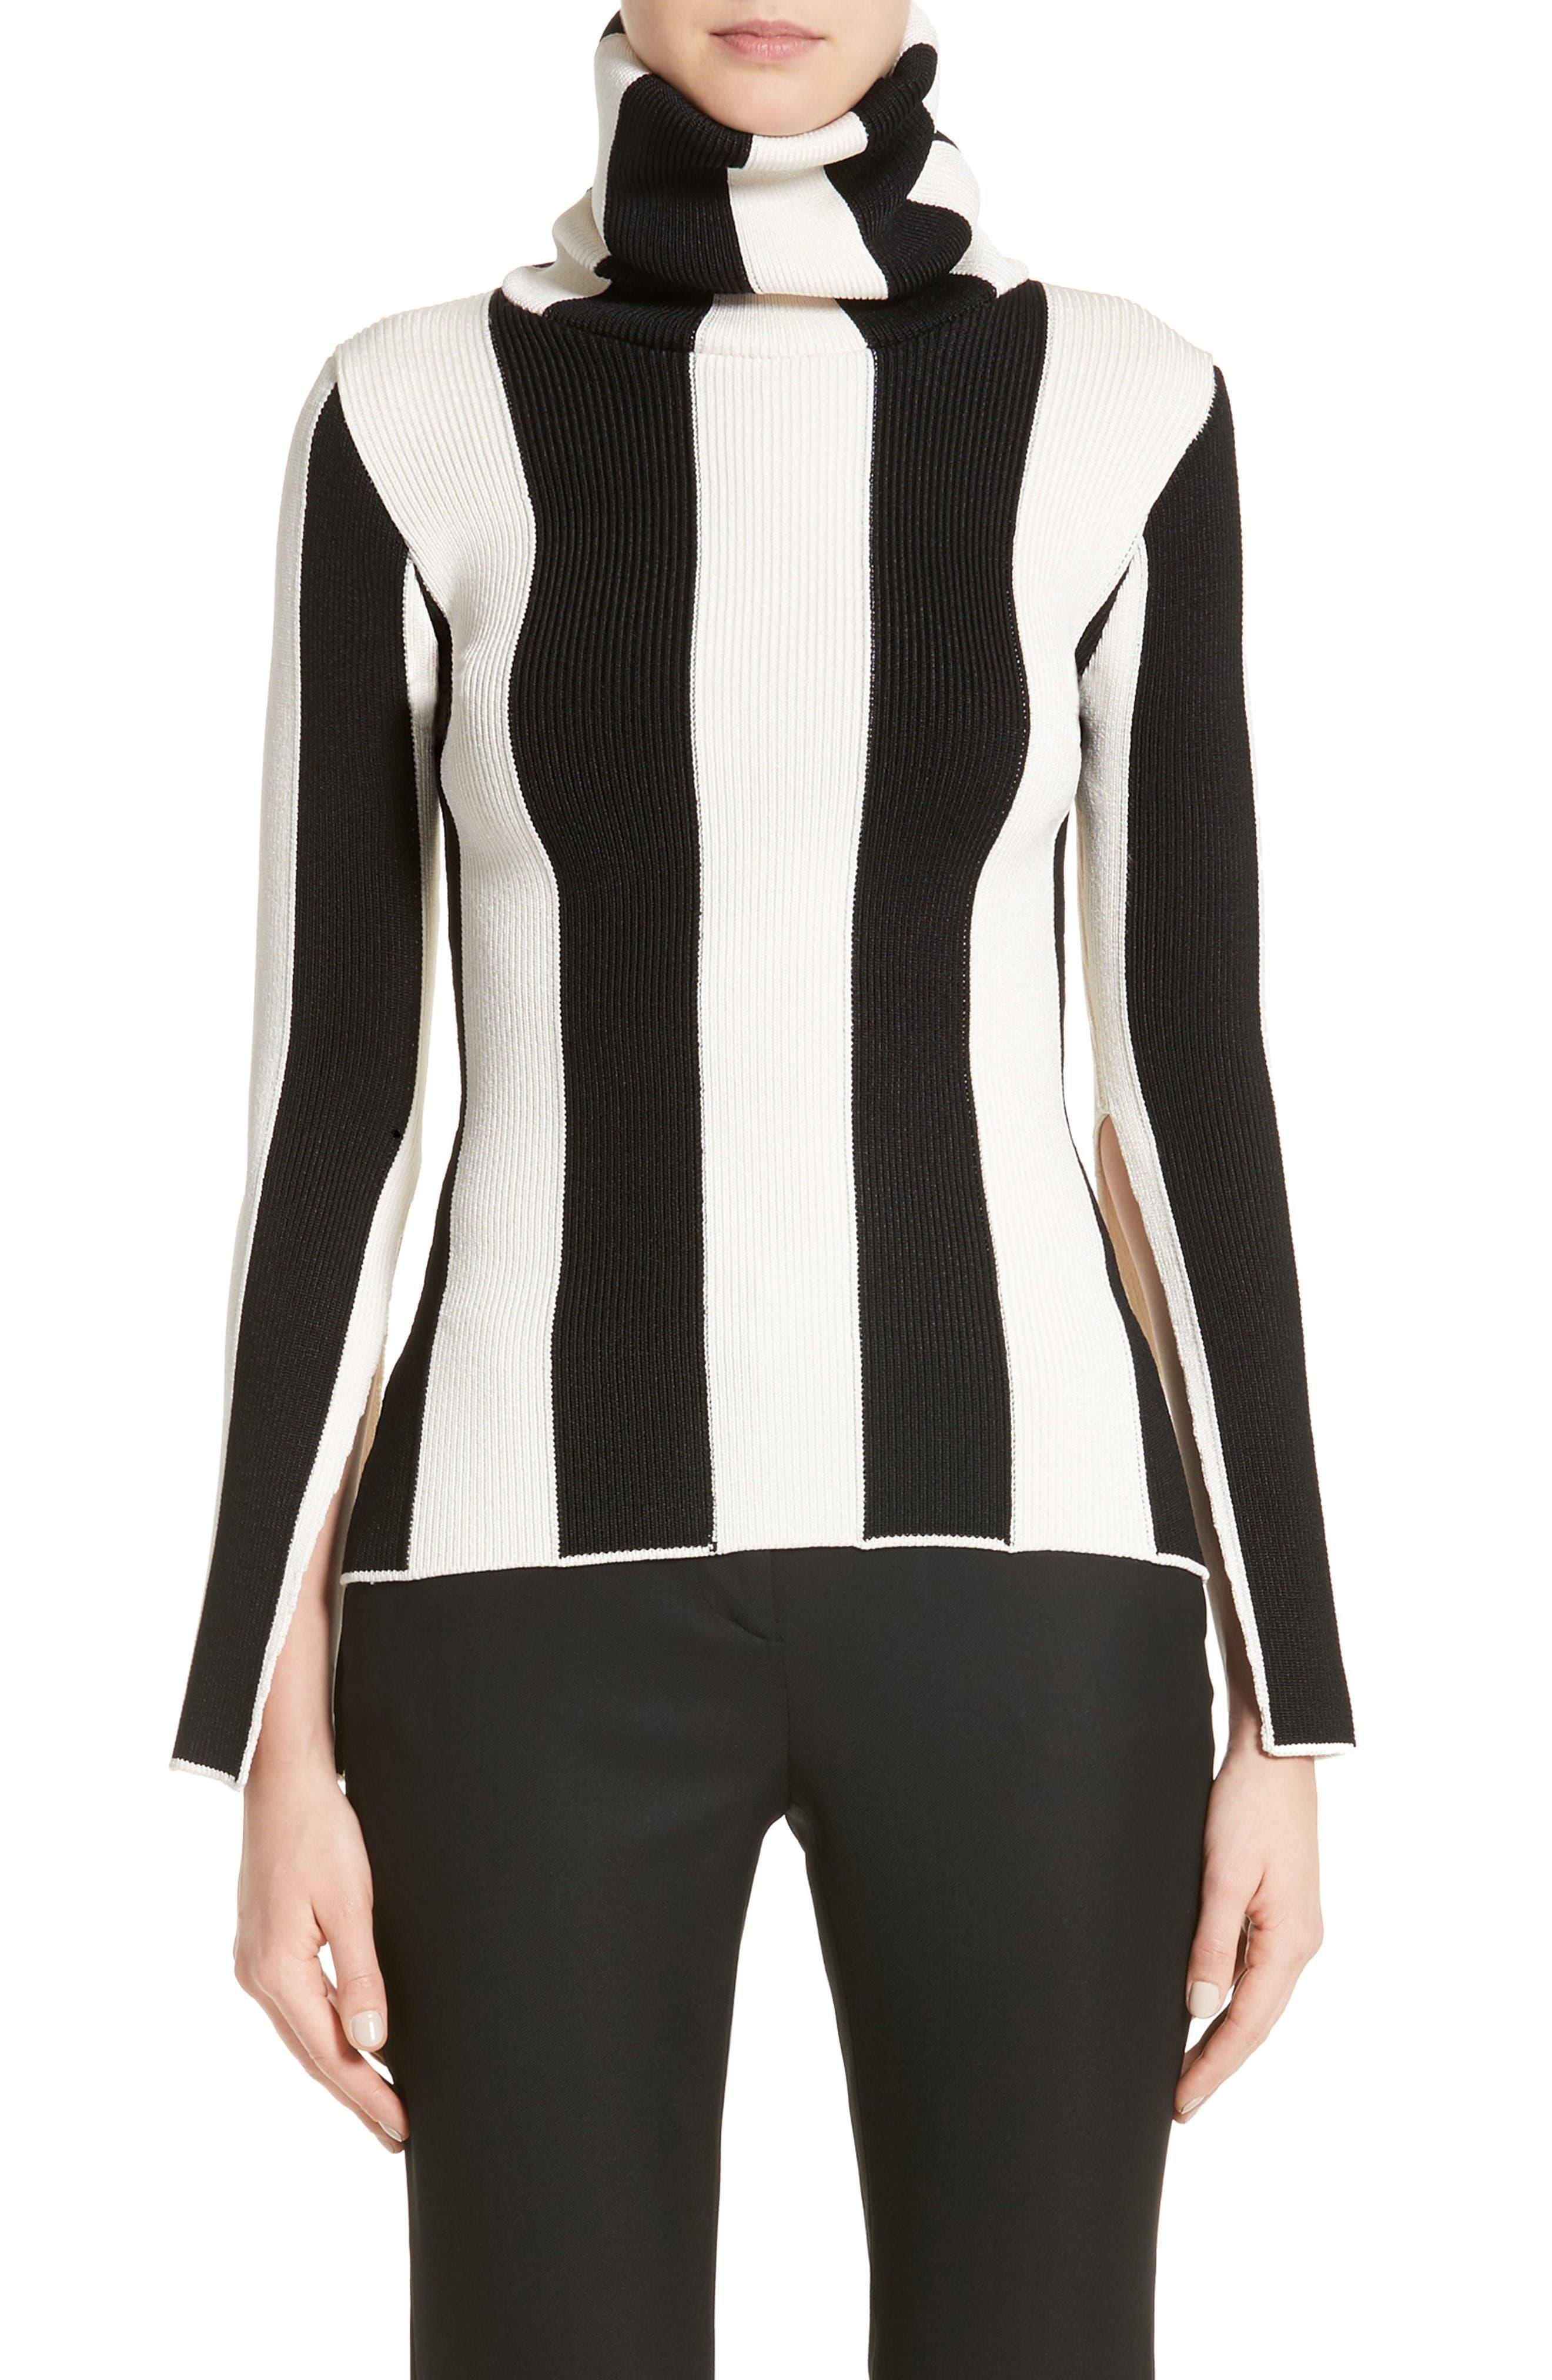 Stripe Turtleneck,                         Main,                         color, Black/ White